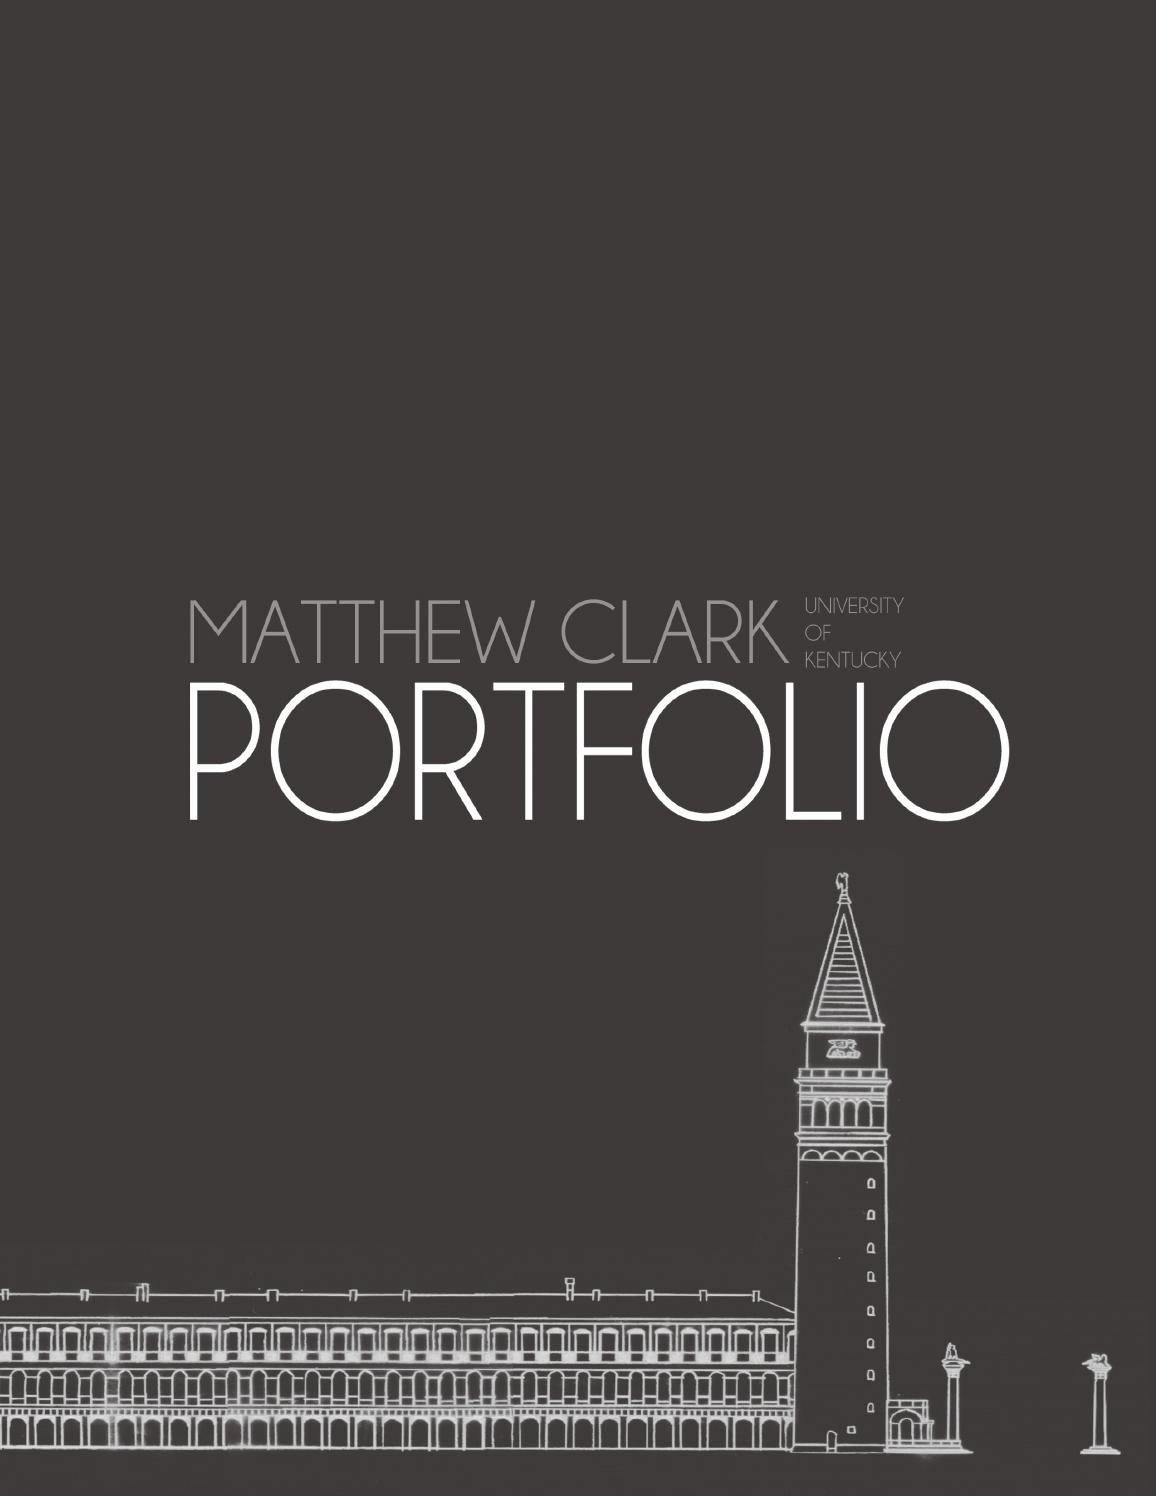 Portfolio Cover Pages Templates Beautiful Matthew Clark Landscape Architecture Portfolio by Matthew